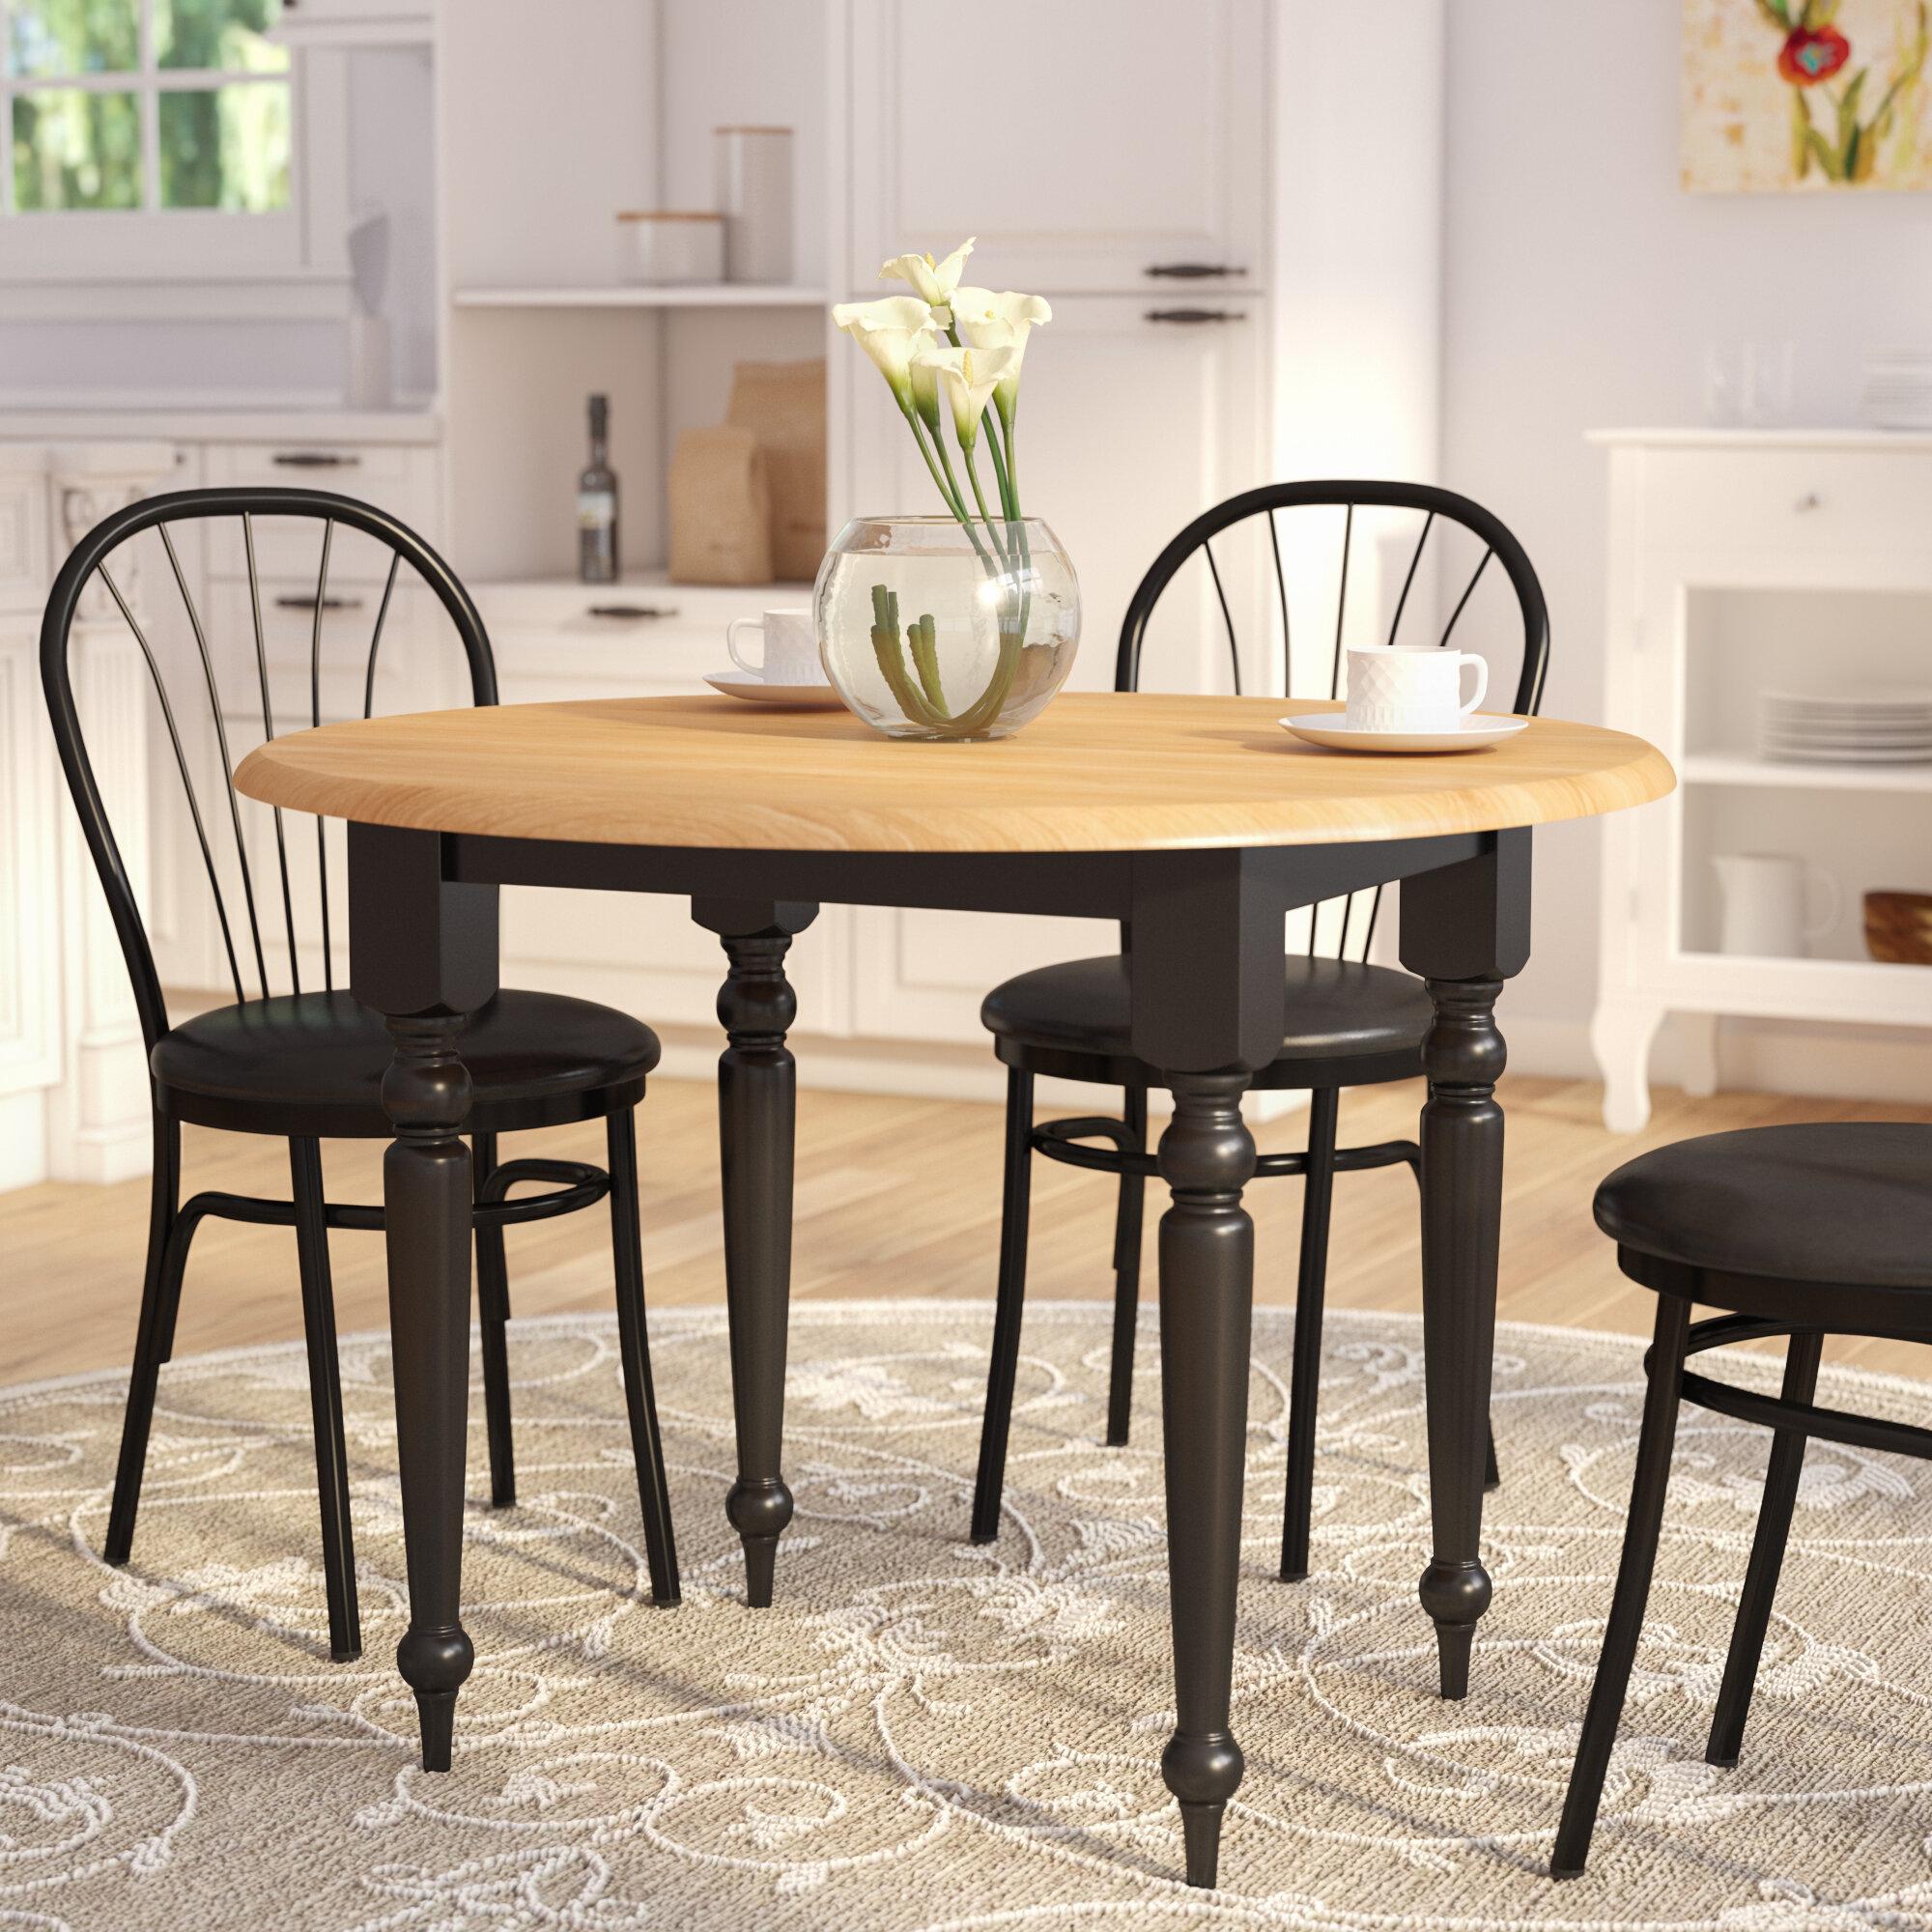 Alcott Hill Cecelia Extendable Drop Leaf Rubberwood Solid Wood Dining Table Reviews Wayfair